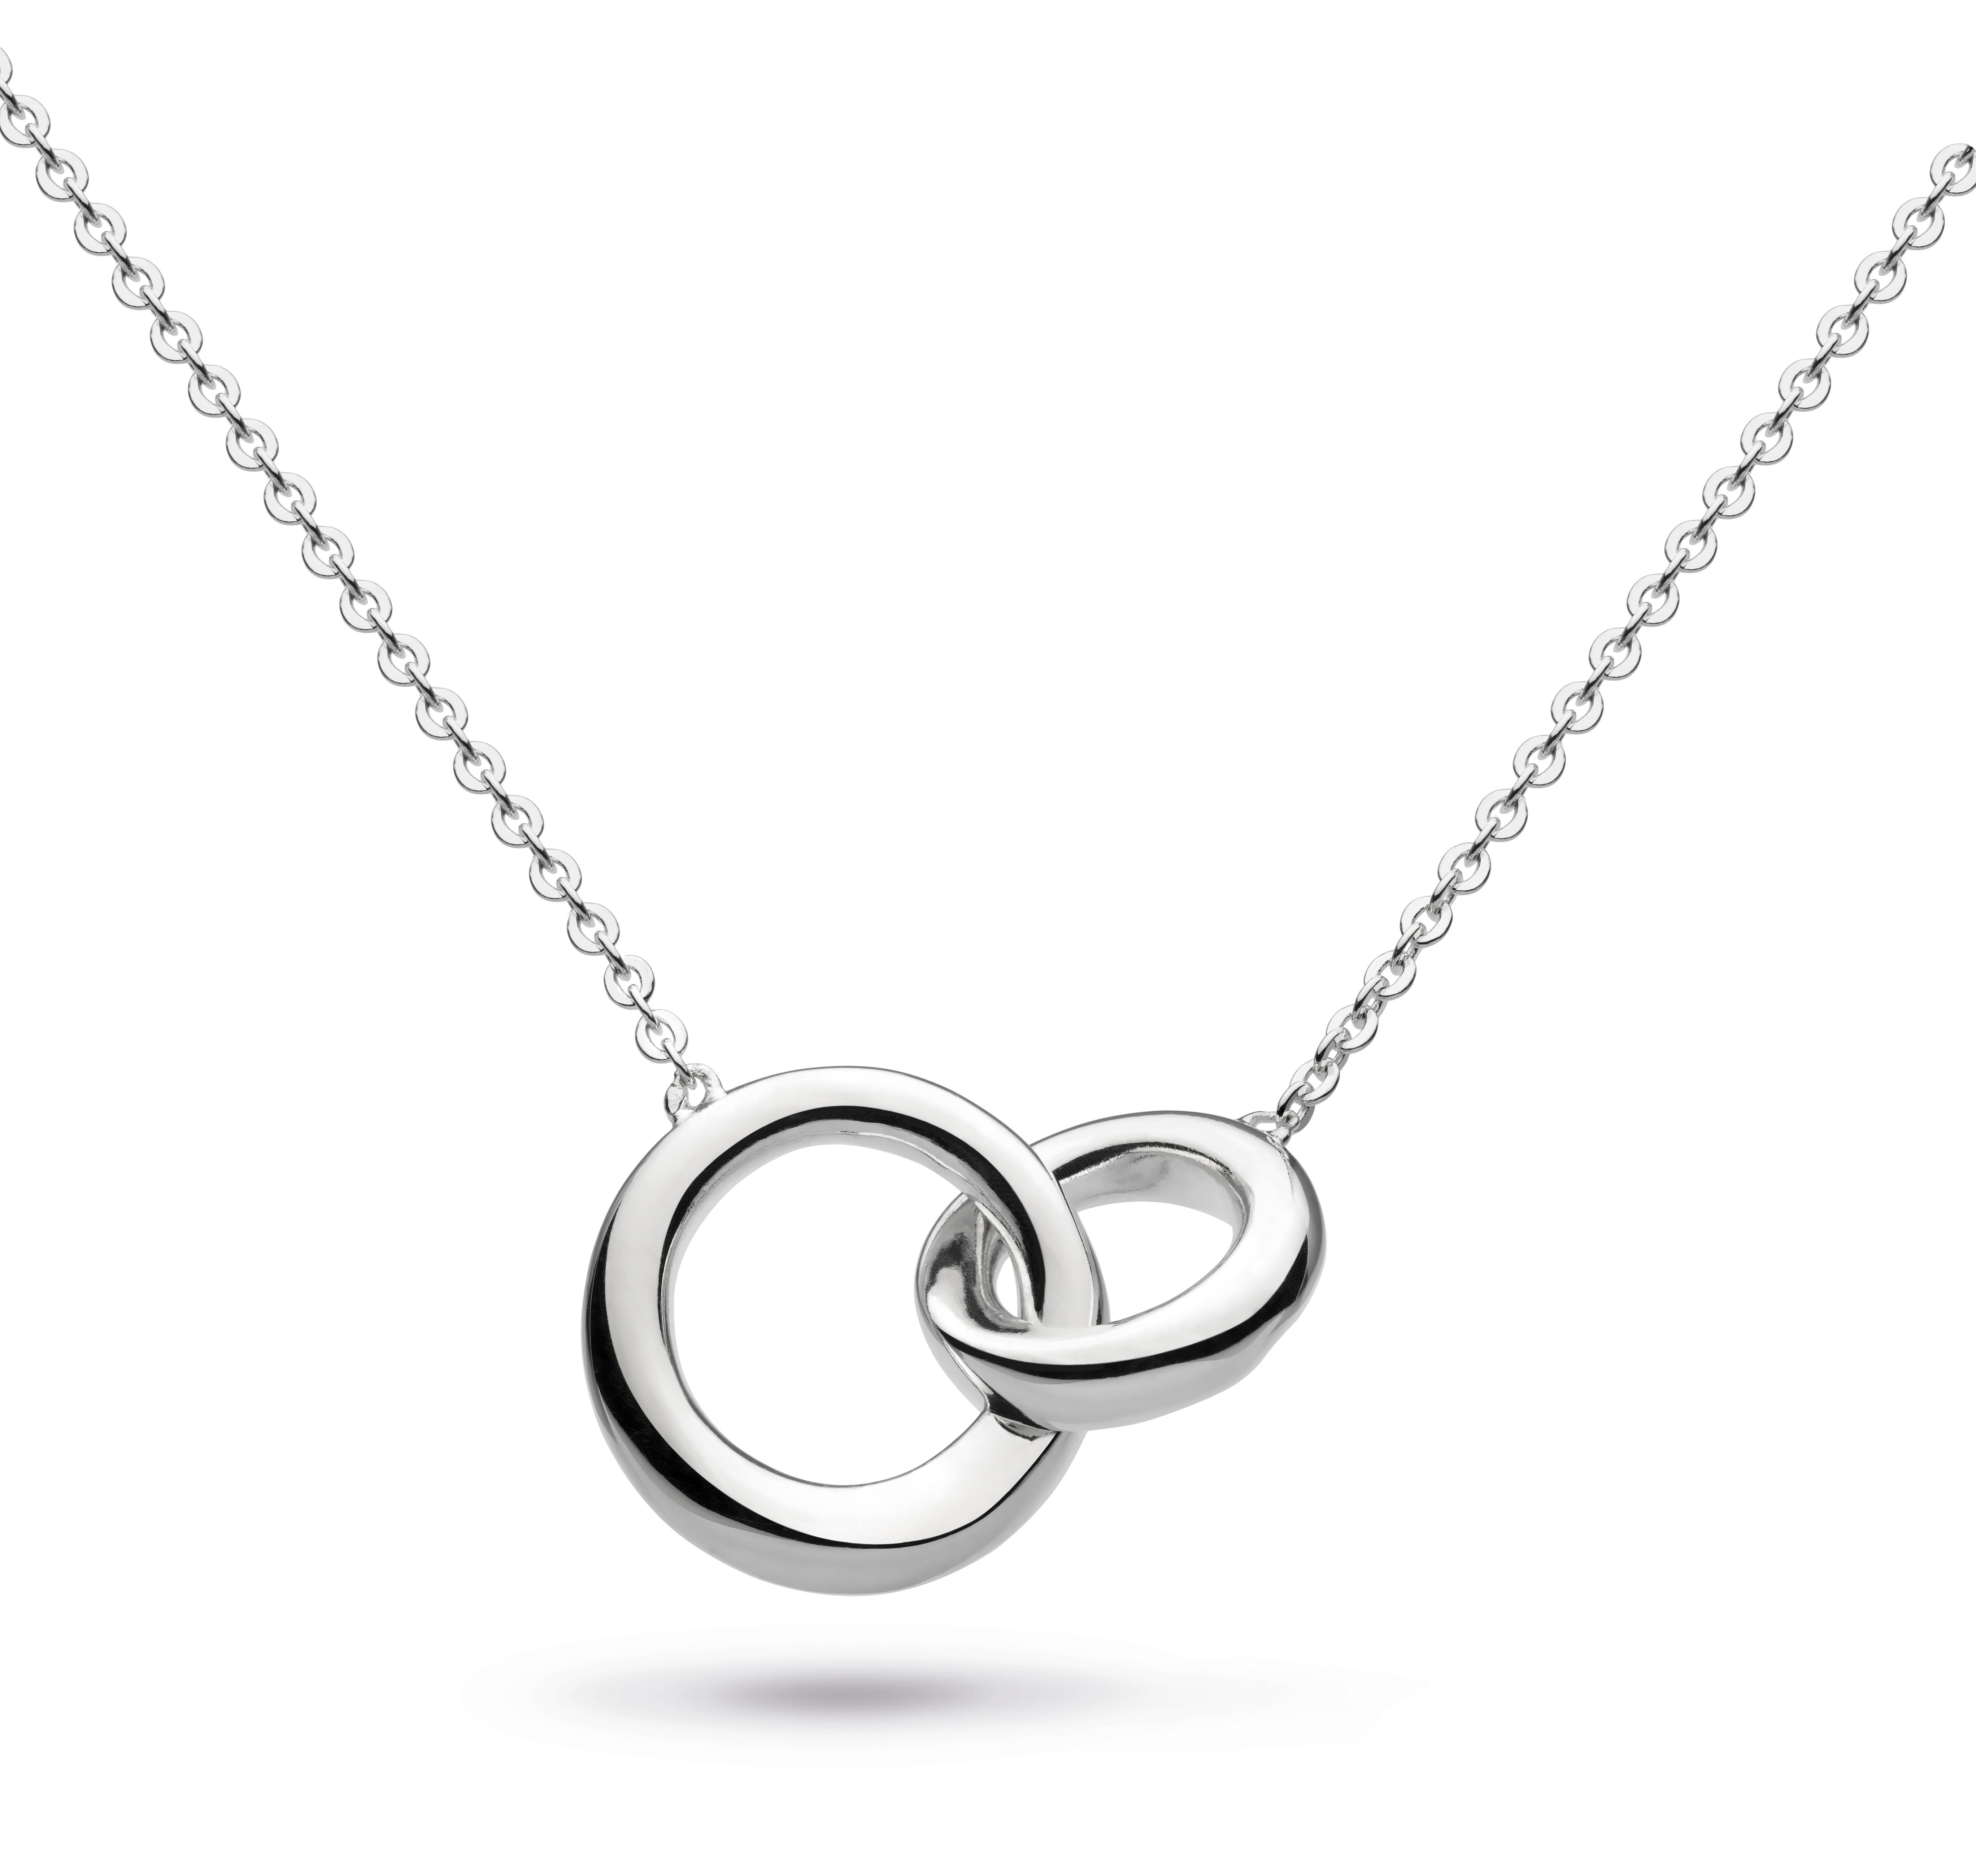 A sterling silver interlocking circles pendant